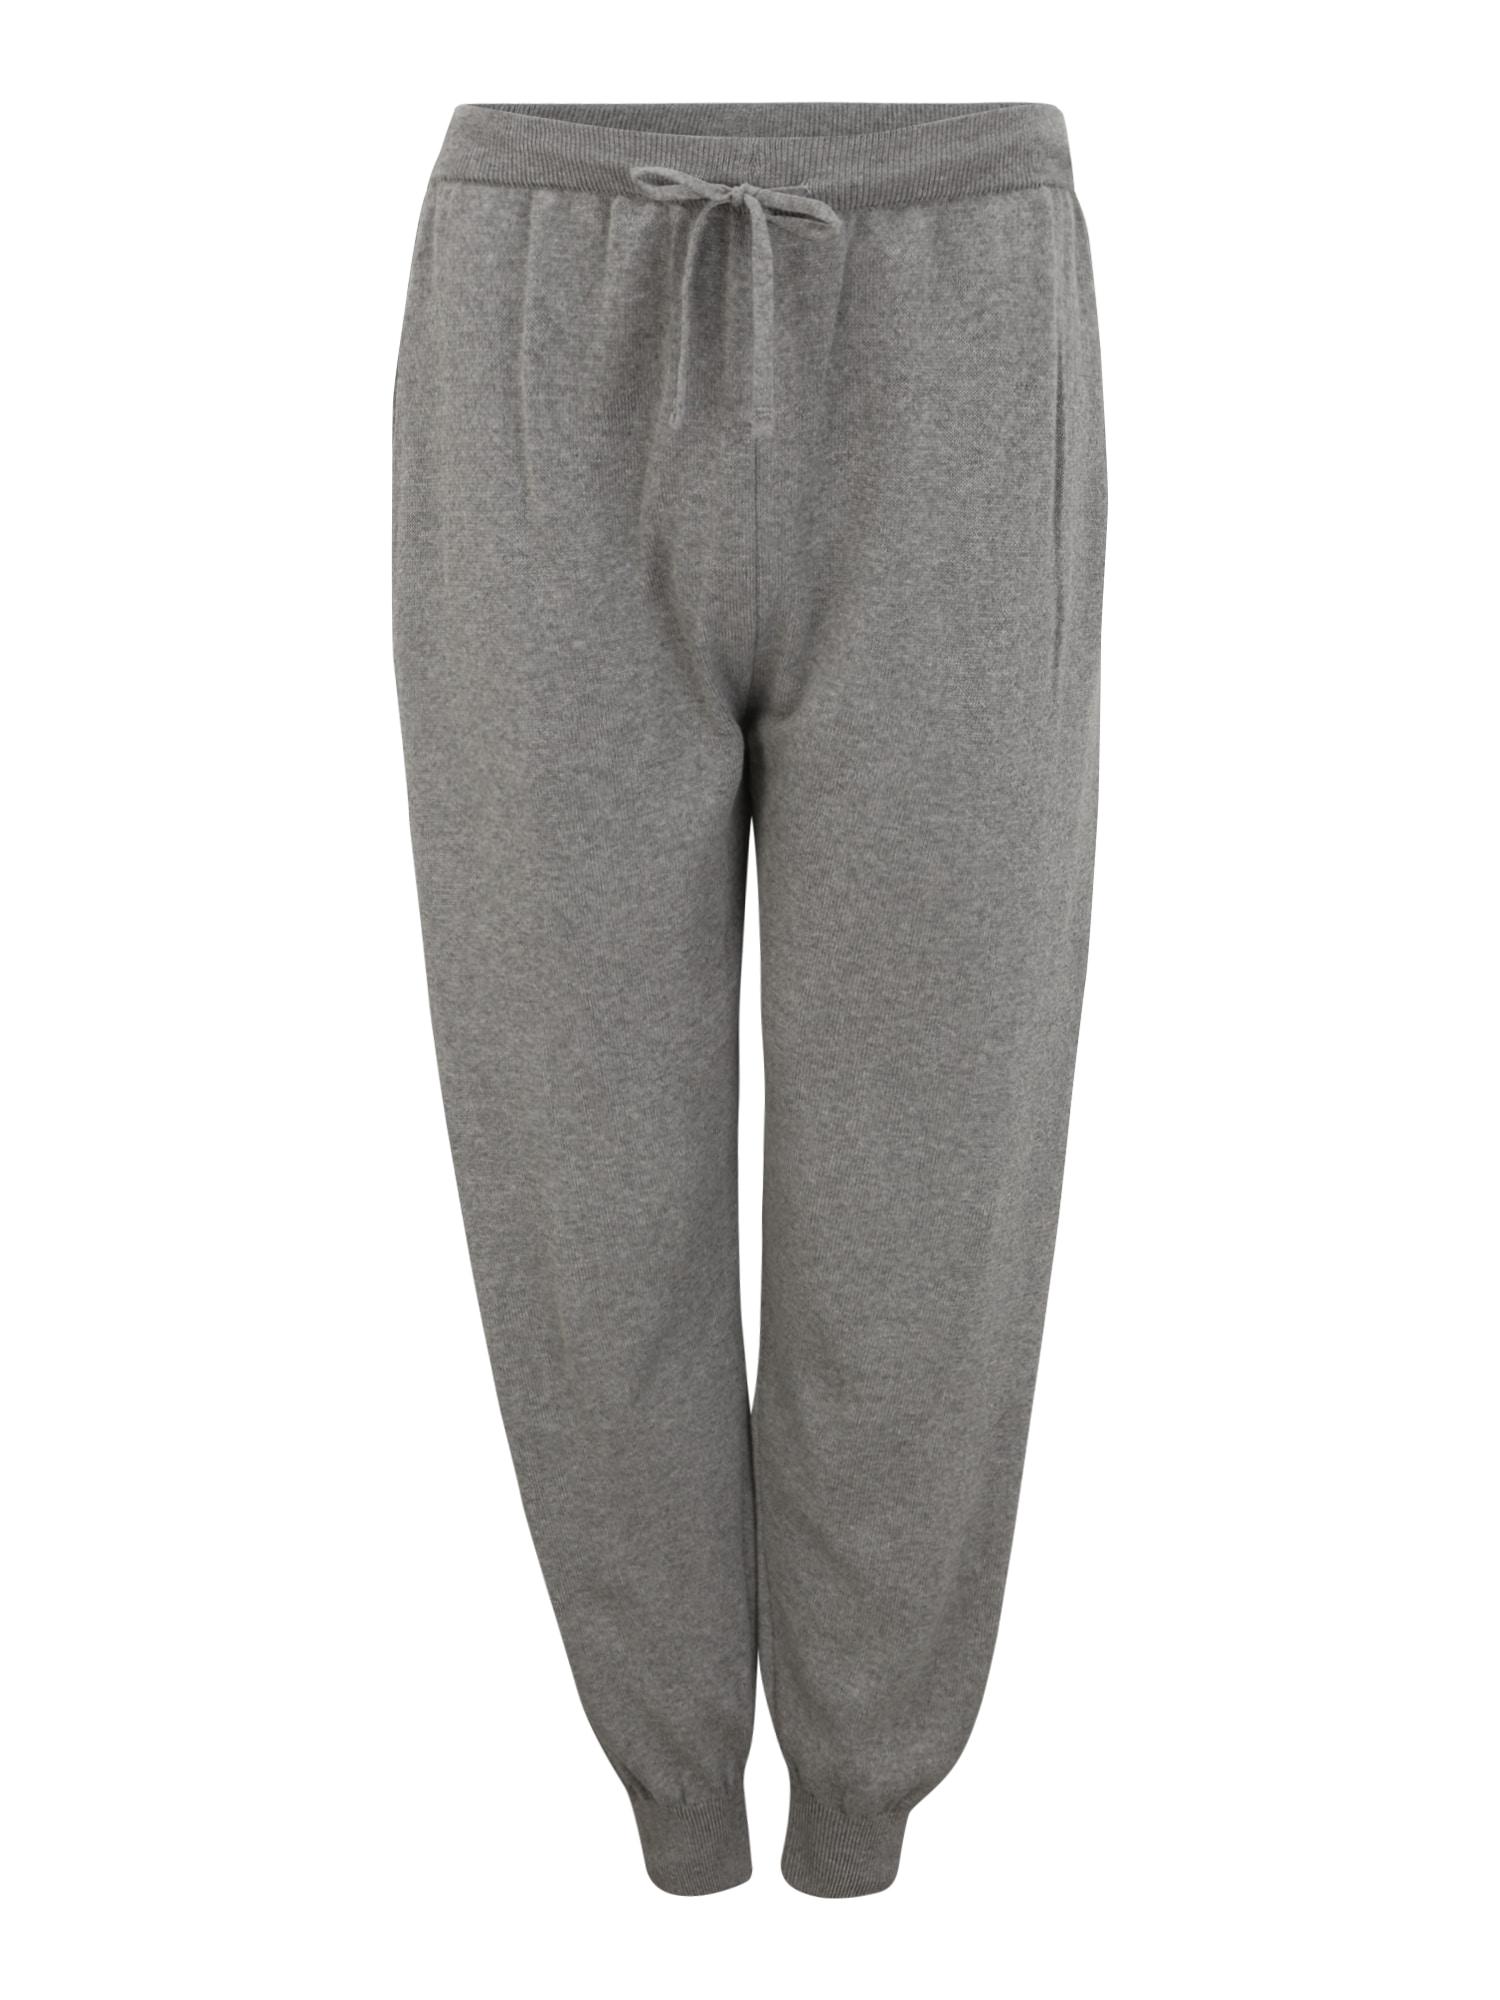 NU-IN Big & Tall Kelnės margai pilka